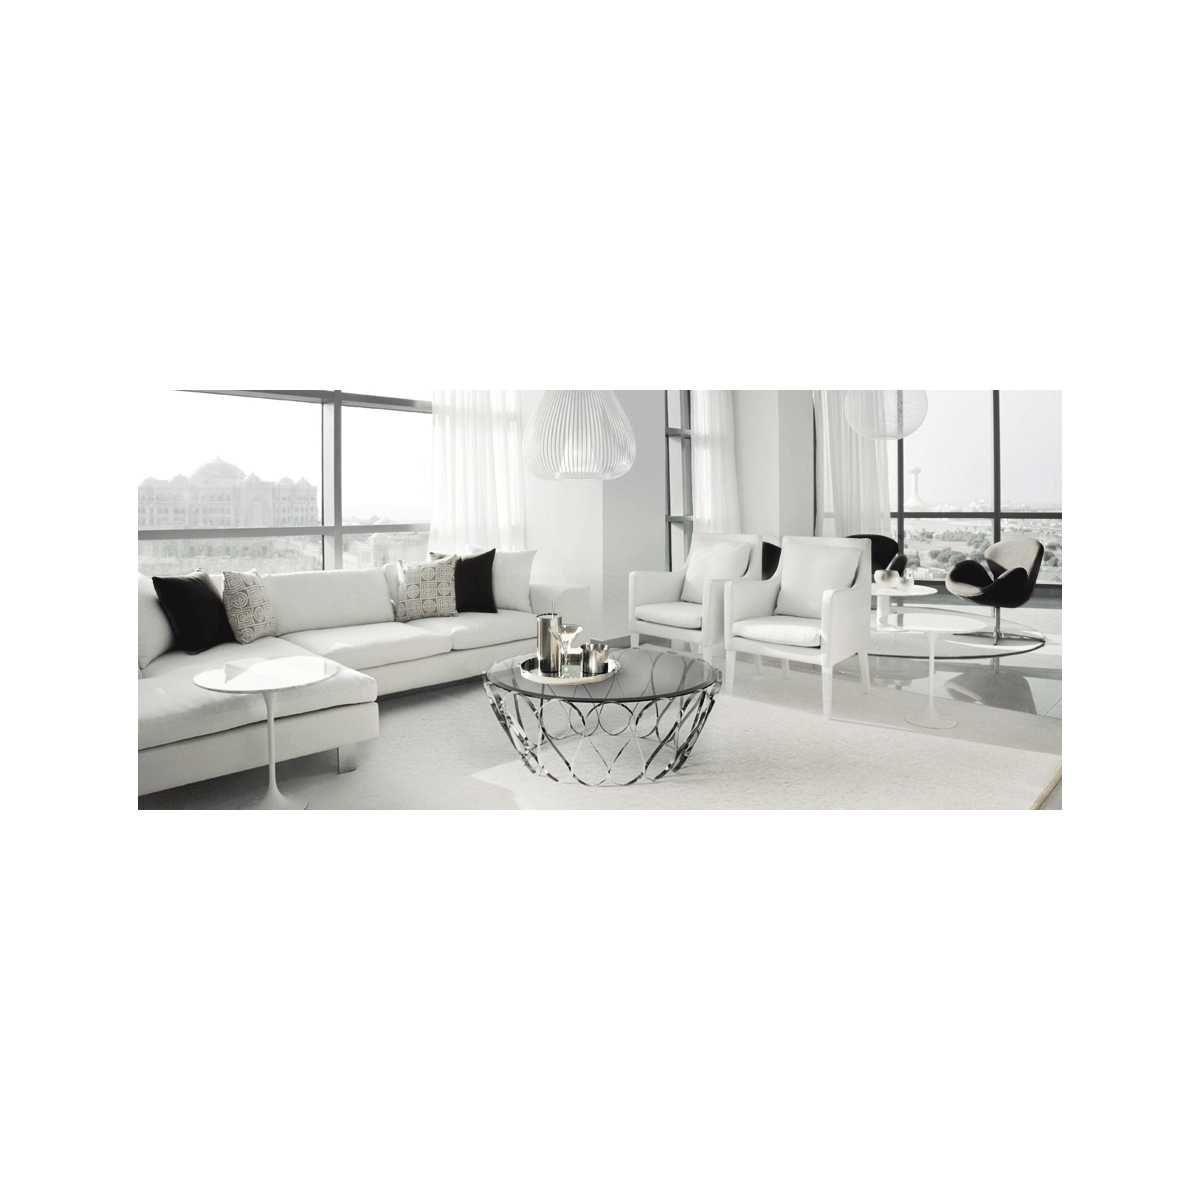 Aquarius Glass Coffee Table, Stainless Steel | Swanky Interiors Regarding Aquarius Dark Grey Sofa Chairs (Image 9 of 20)